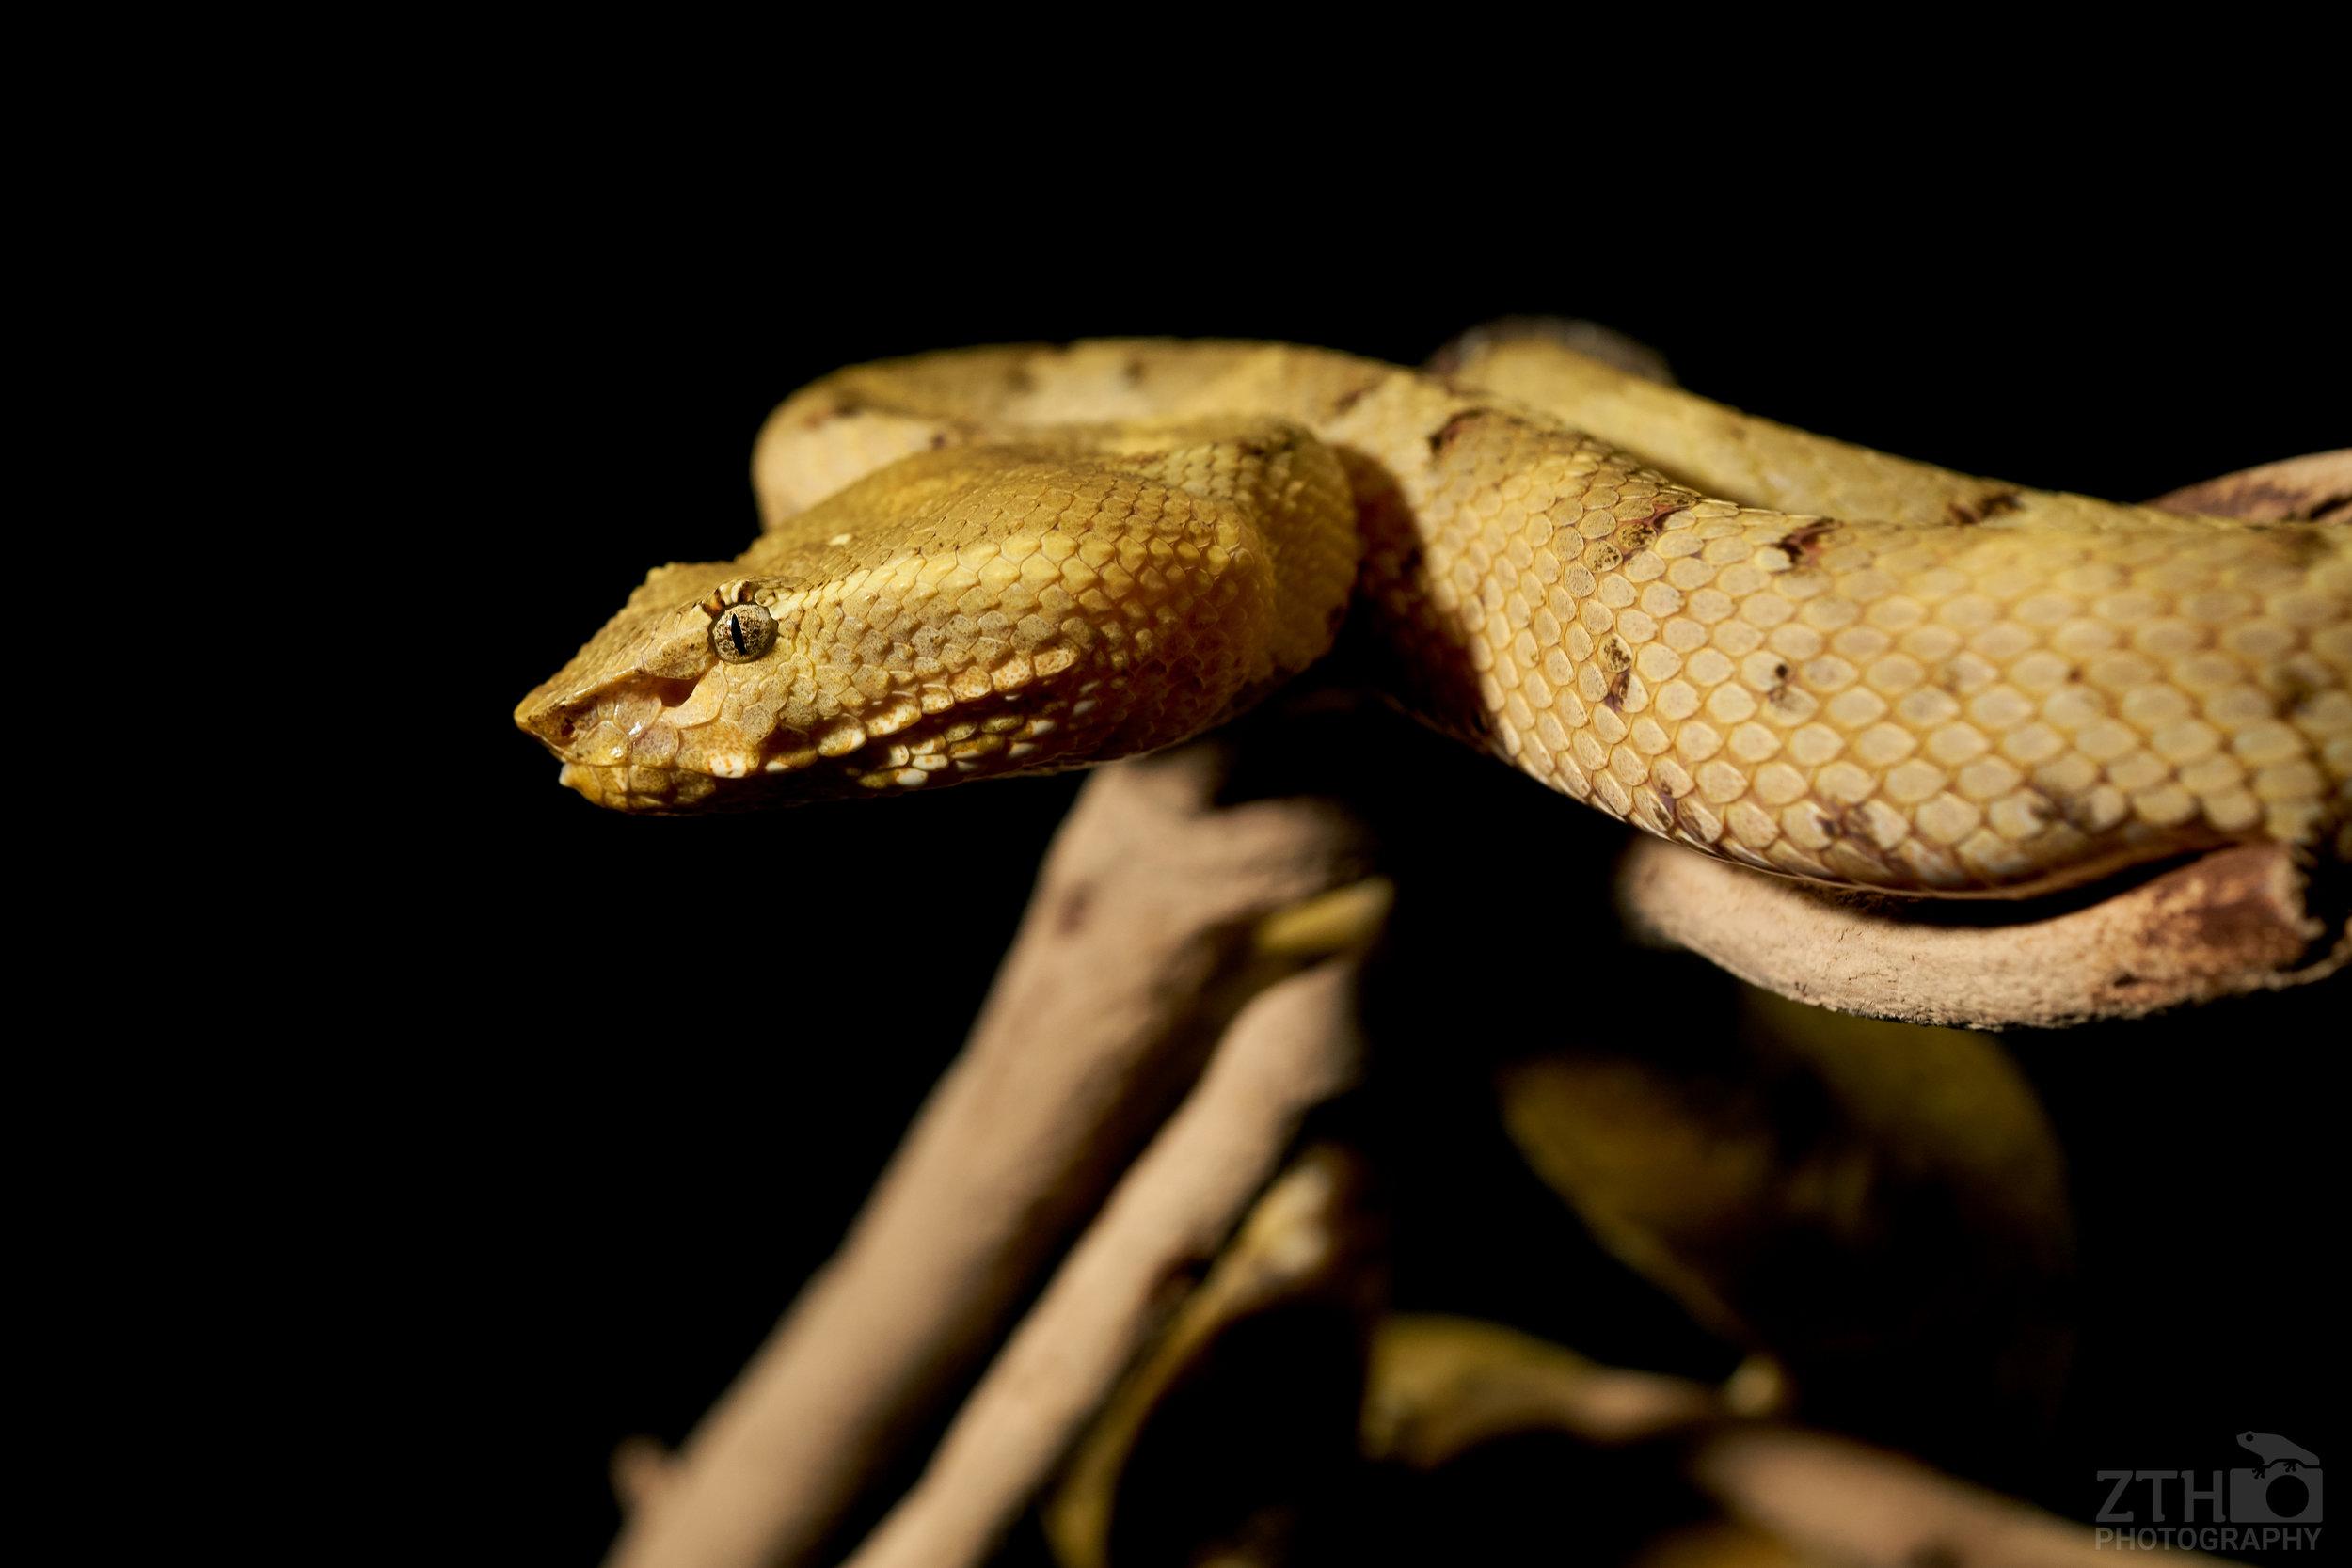 Green snake macro photography